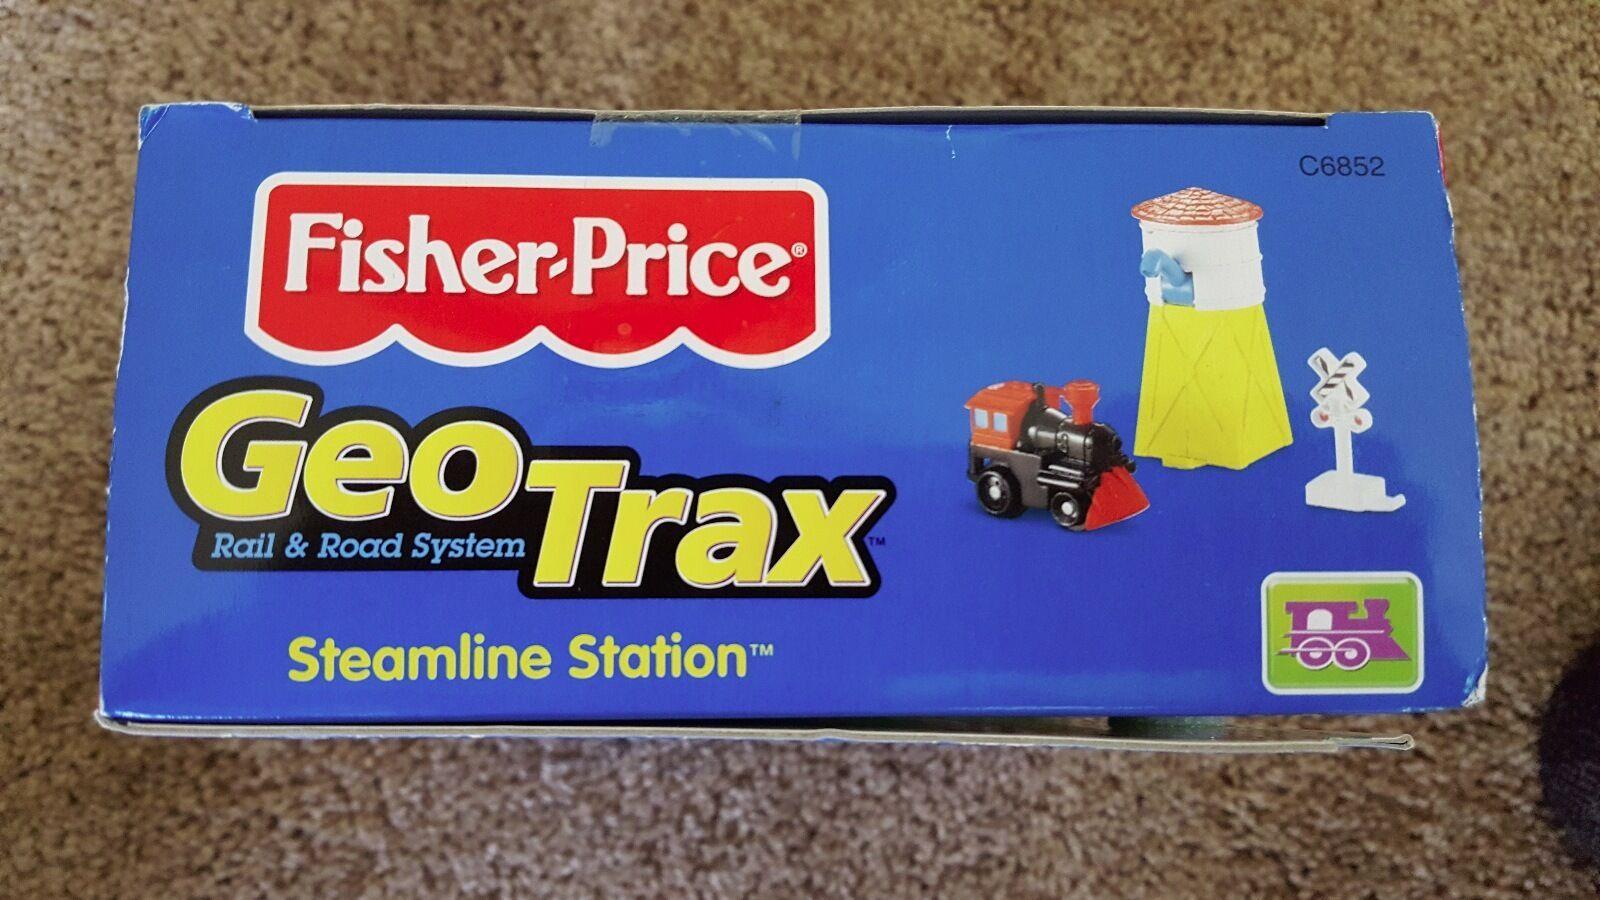 Fisher-Price GeoTrax GeoTrax GeoTrax Steamline Station C6852 N.I.B-Retired Rare 0246ae